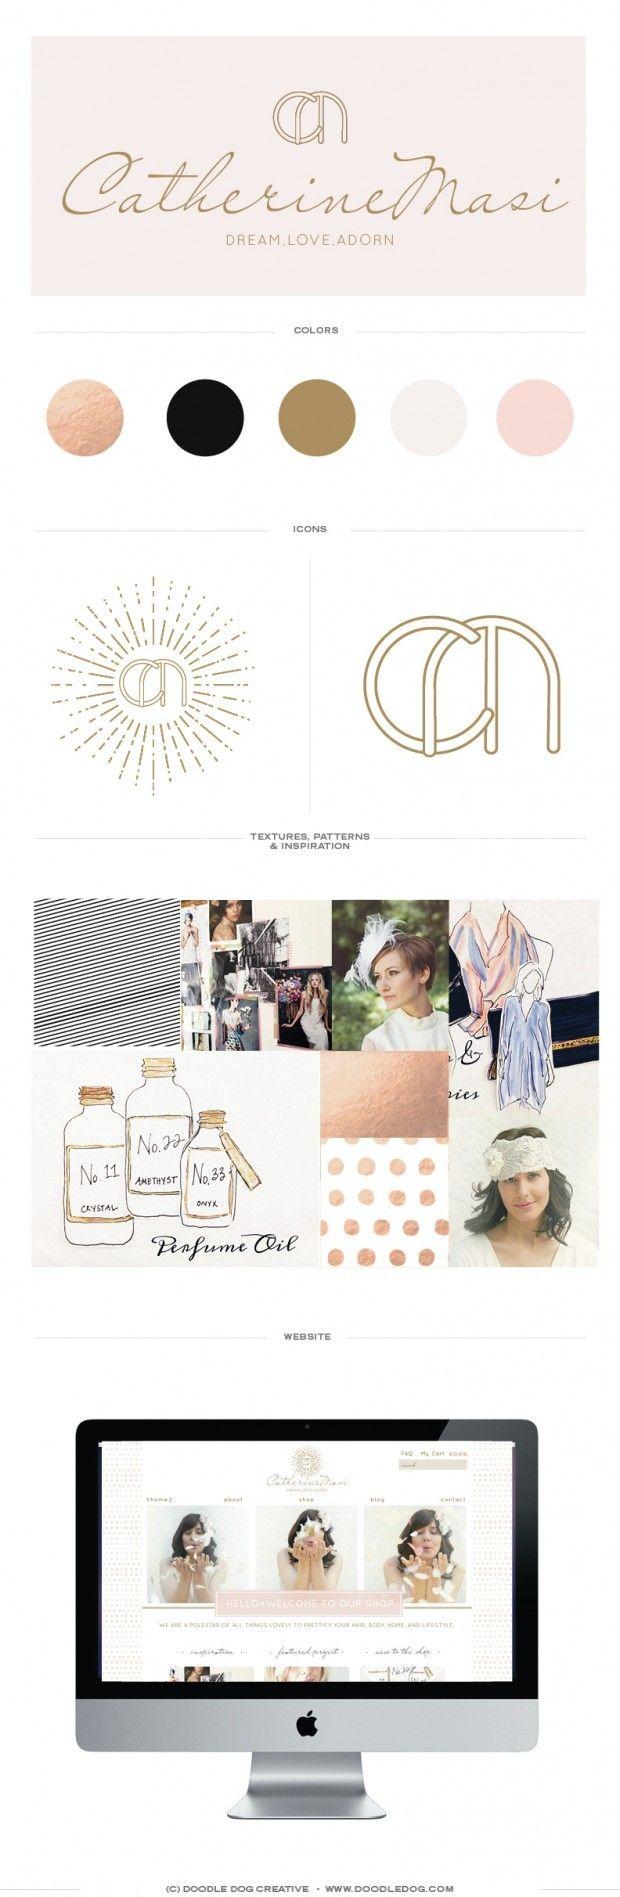 Brand Identity for fashion driven eCommerce website, Catherine Masi! — Doodle Dog Creative. custom logo design, custom branding, custom site, custom website design, custom site design, logo inspiration